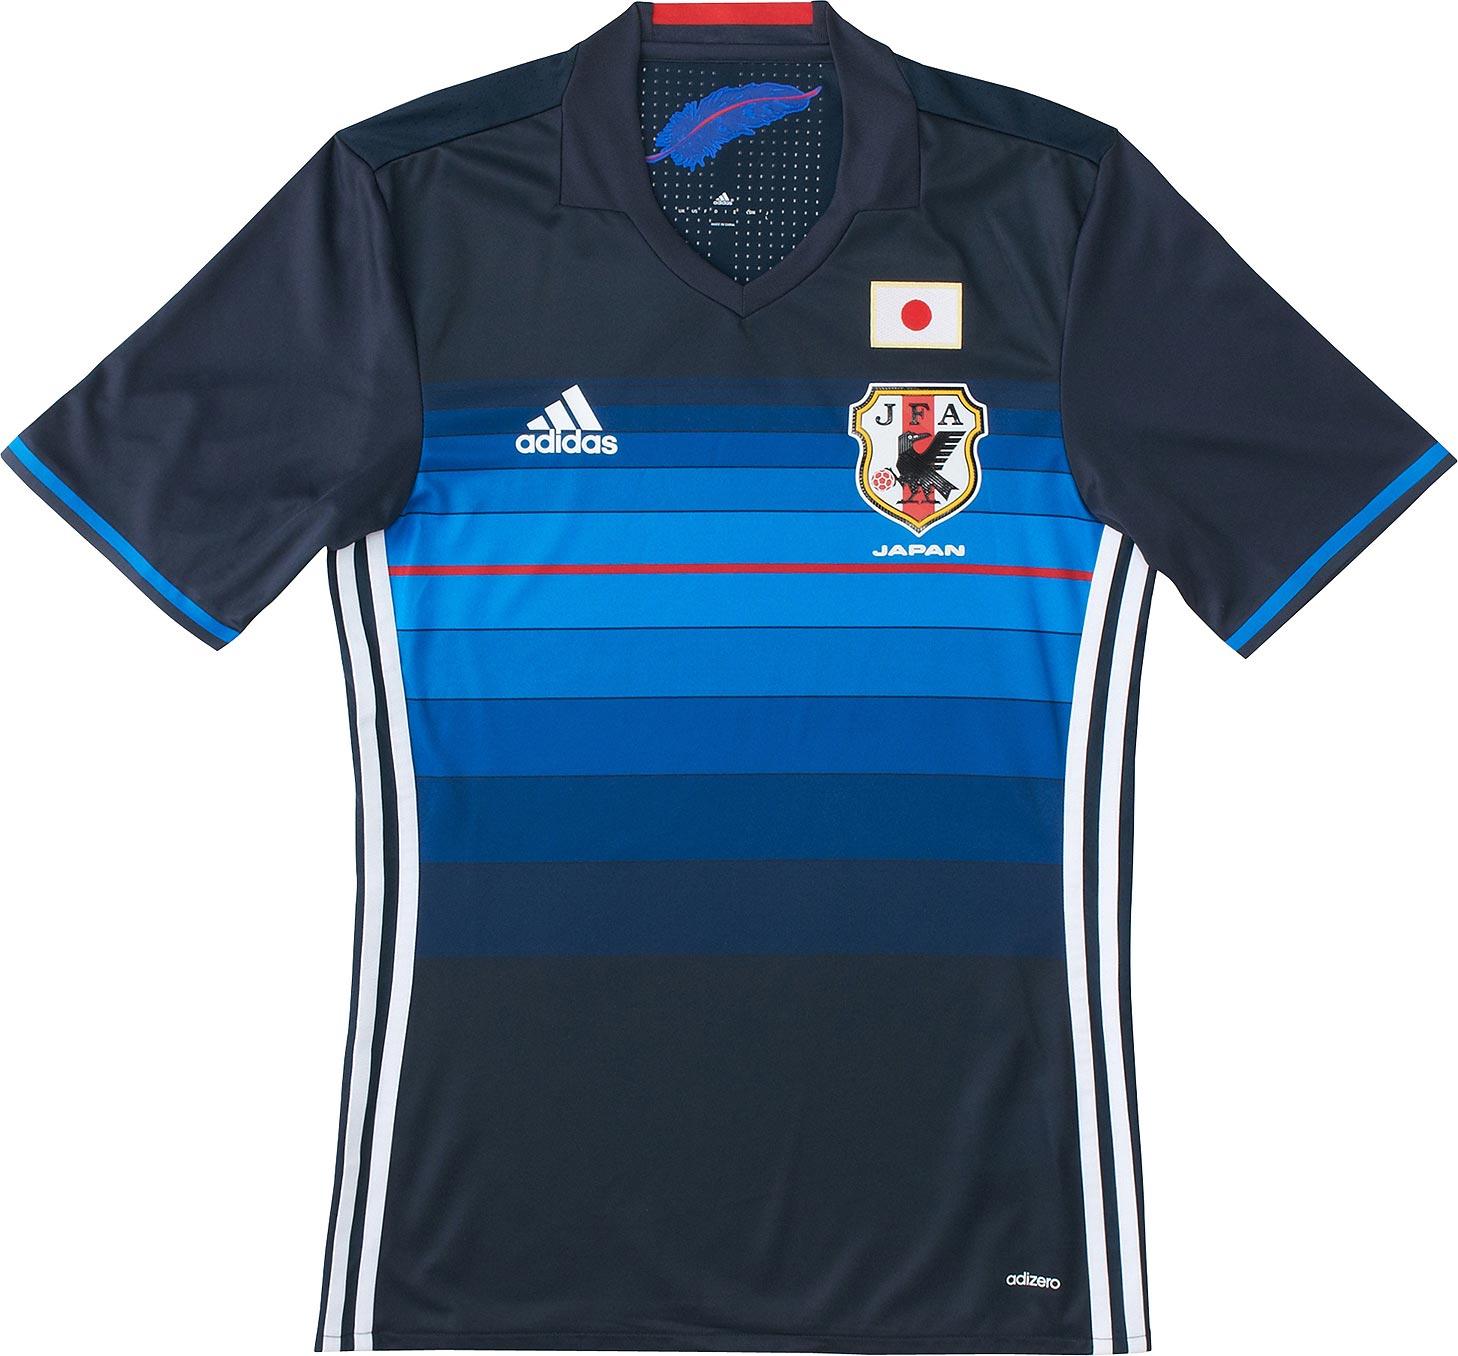 adidas 2016 jersey